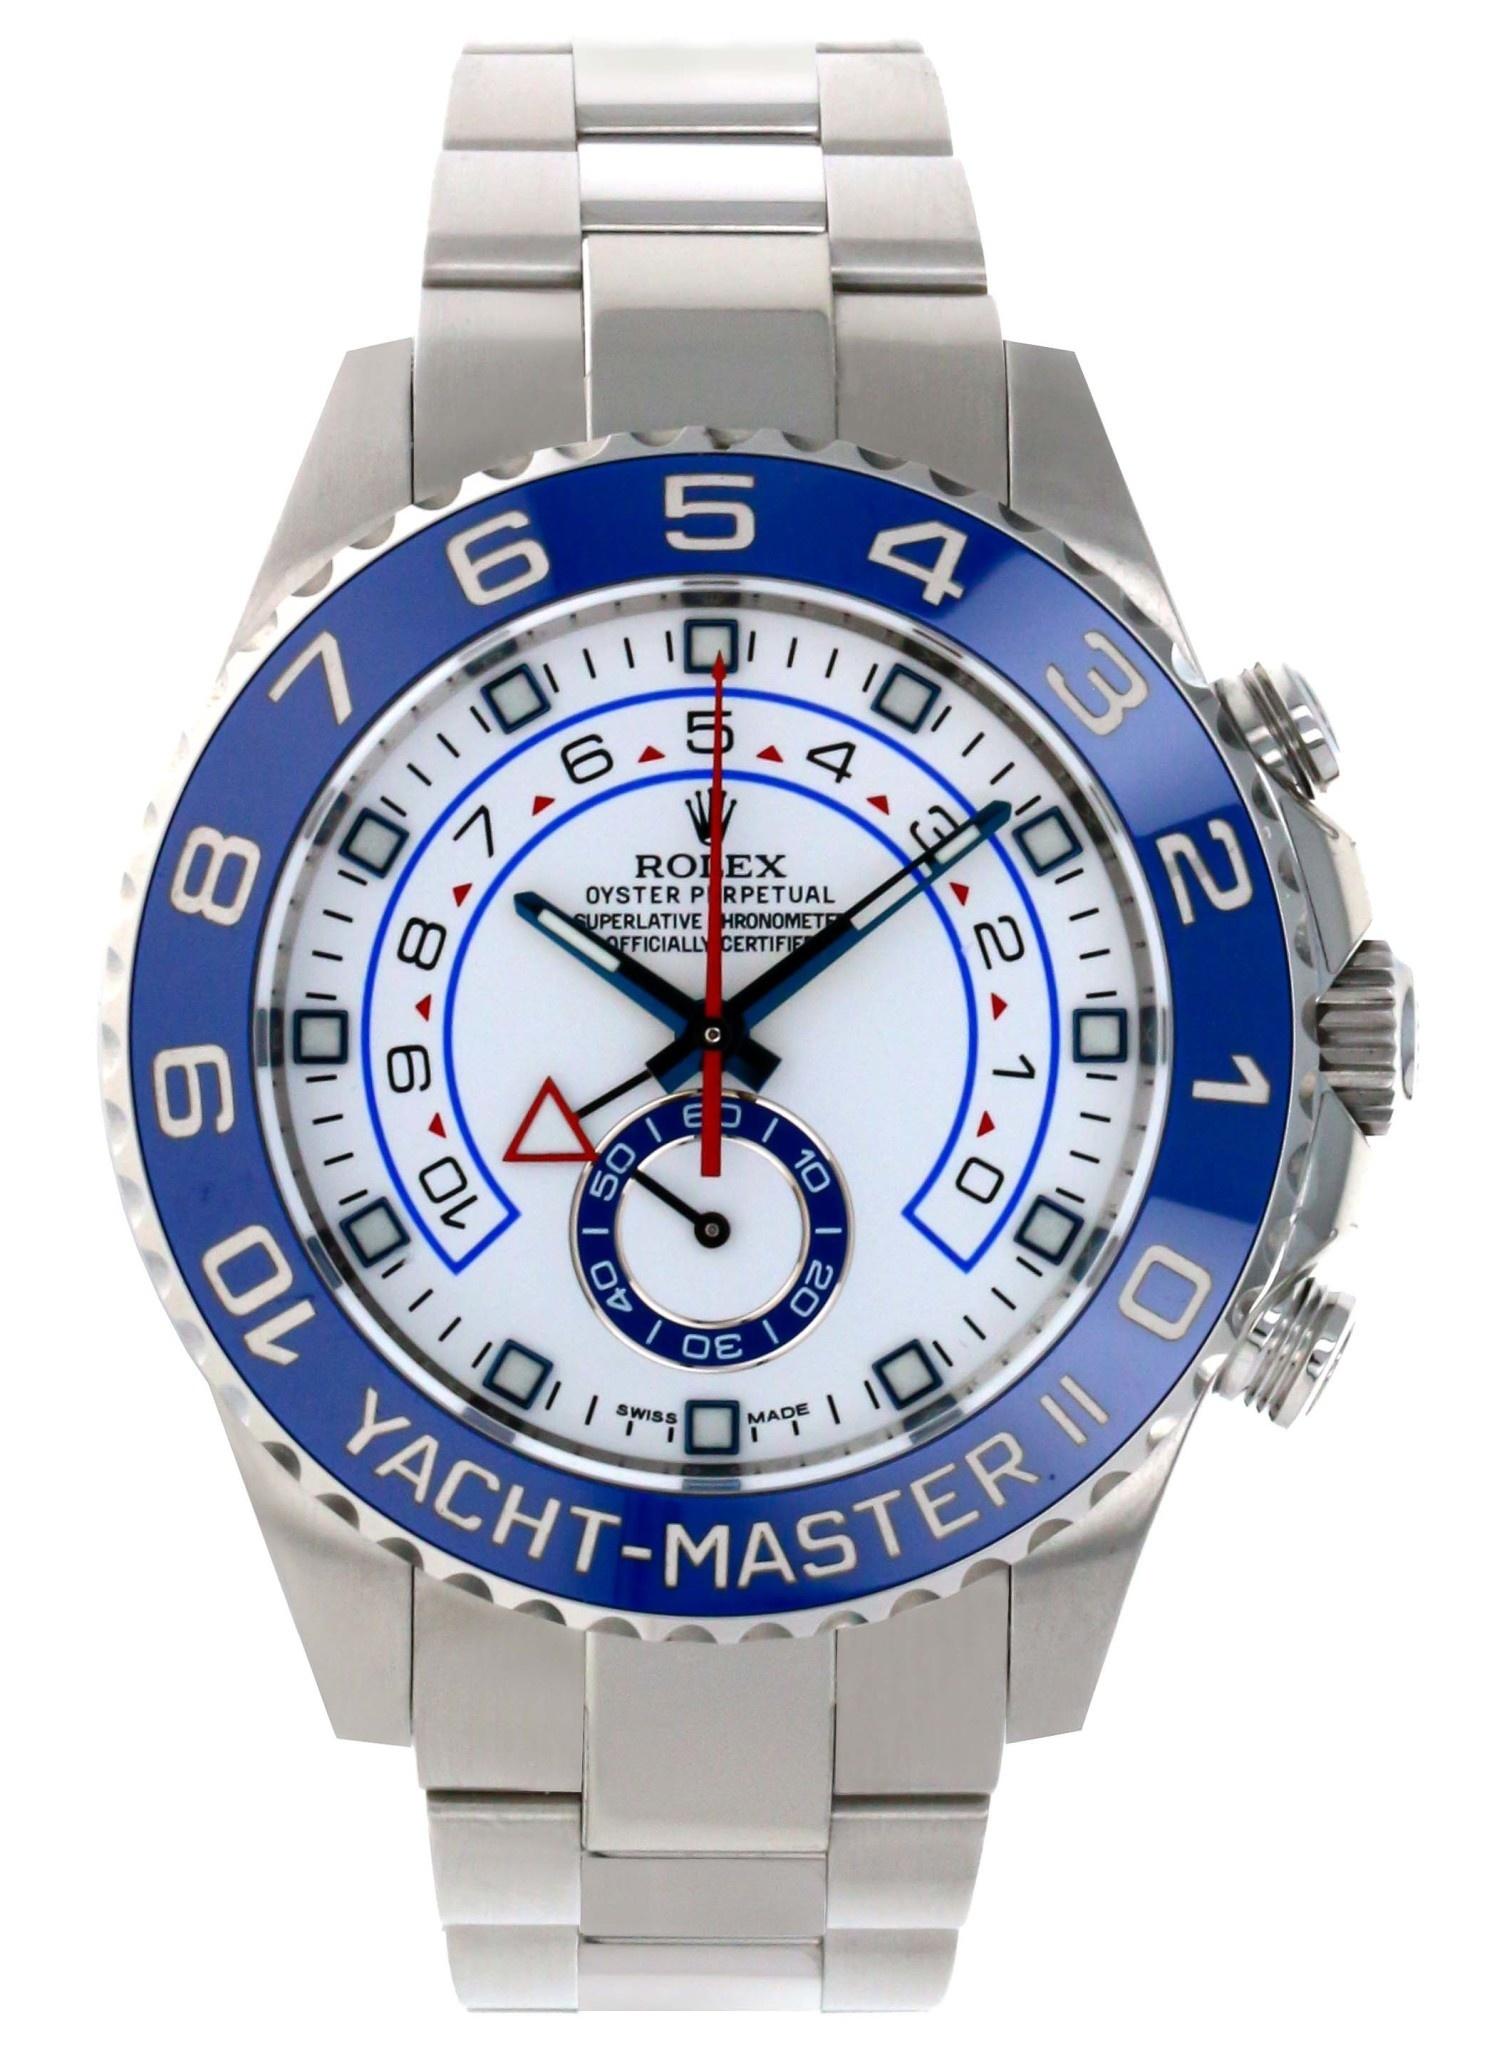 The best luxury watch for men